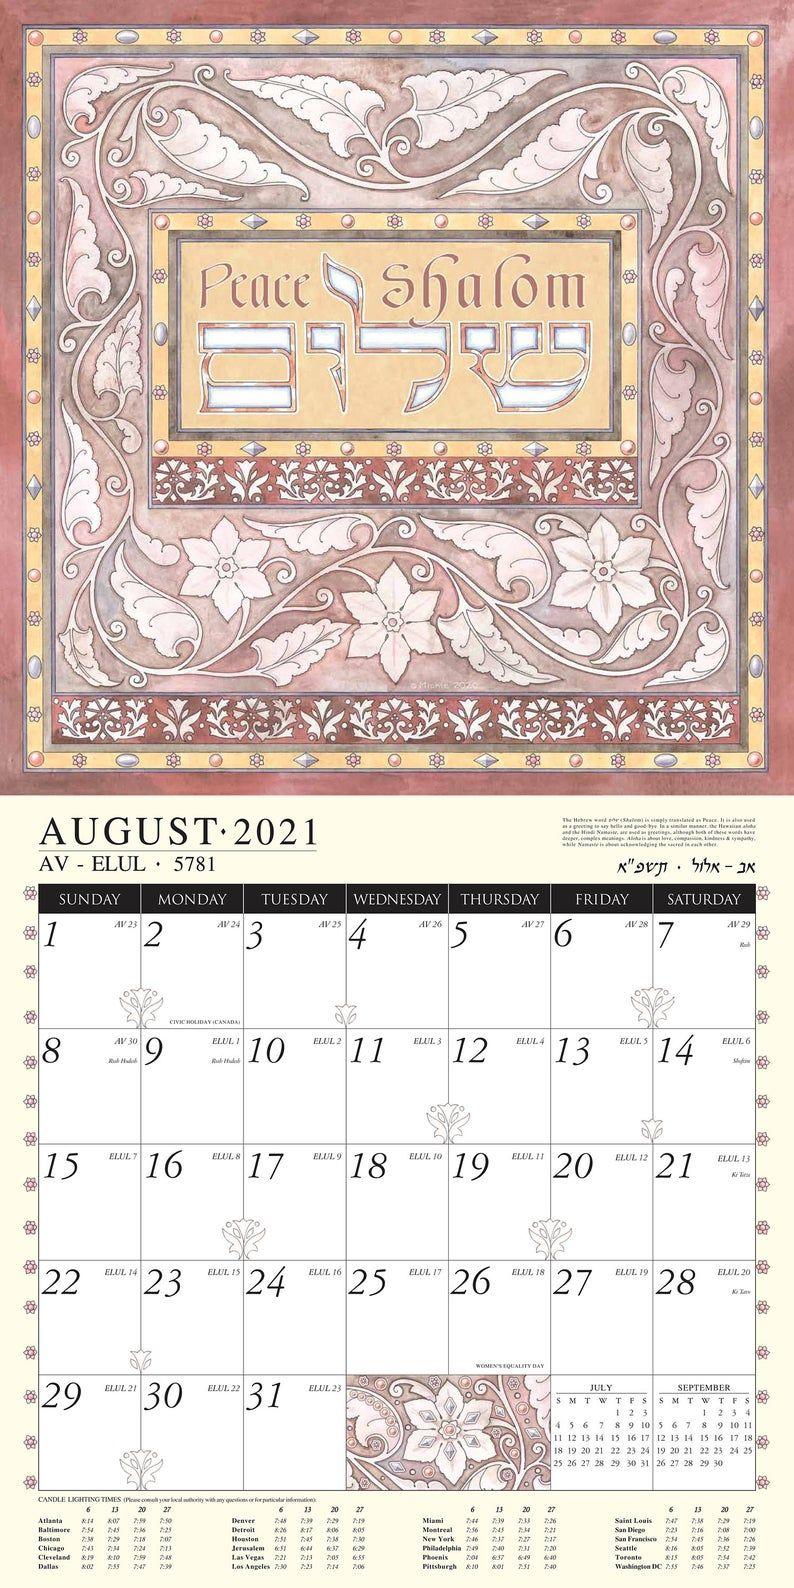 Torah Portion Calendar 2022.Jewish Art Calendar 2022 Mickie Caspi 16 Month Wall Etsy In 2021 Art Calendar Jewish Art Jewish Holiday Calendar